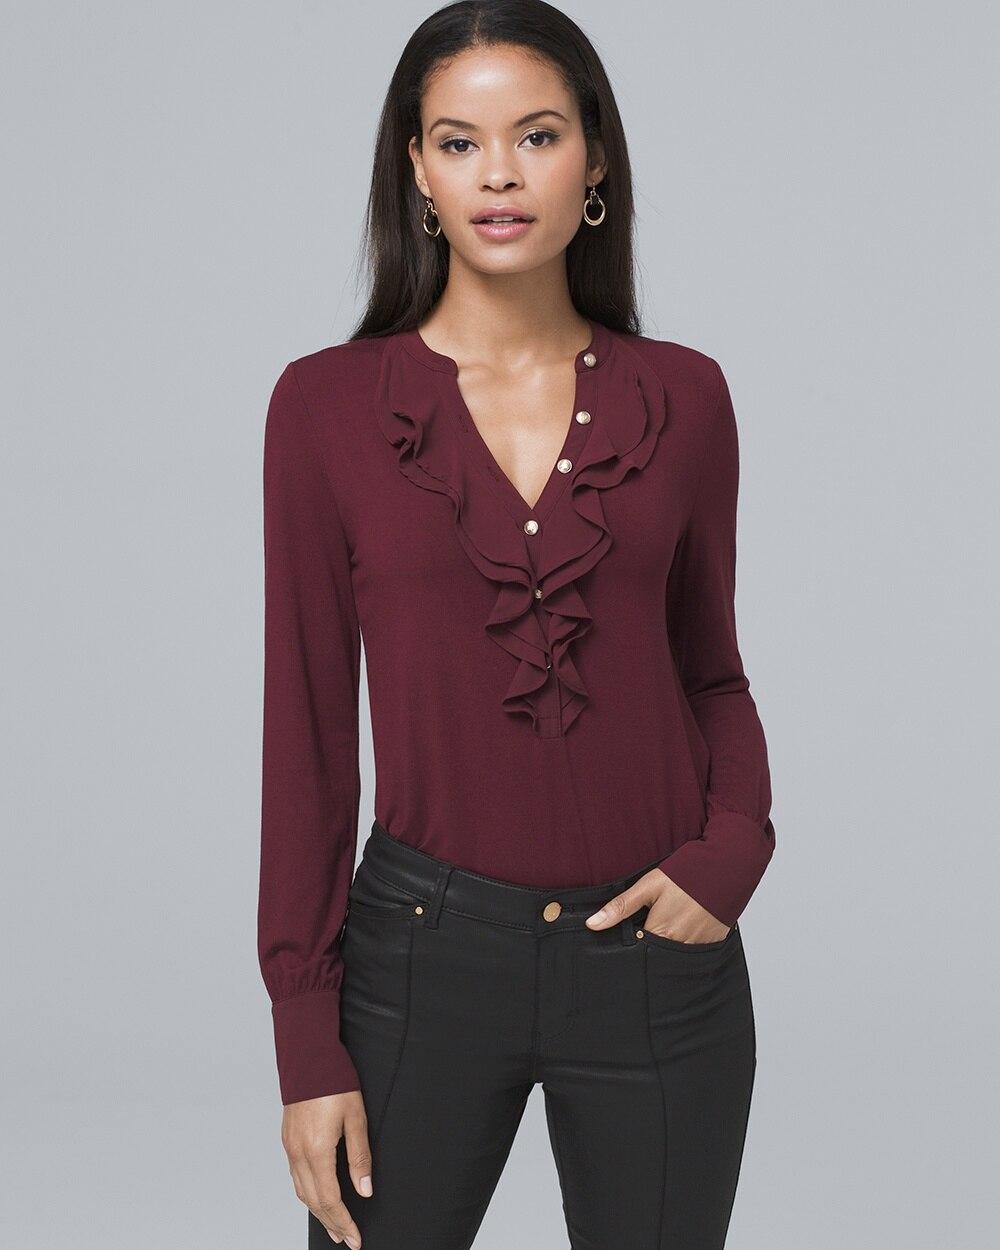 59c05039a Ruffle-Trim Military-Button Knit Blouse - White House Black Market